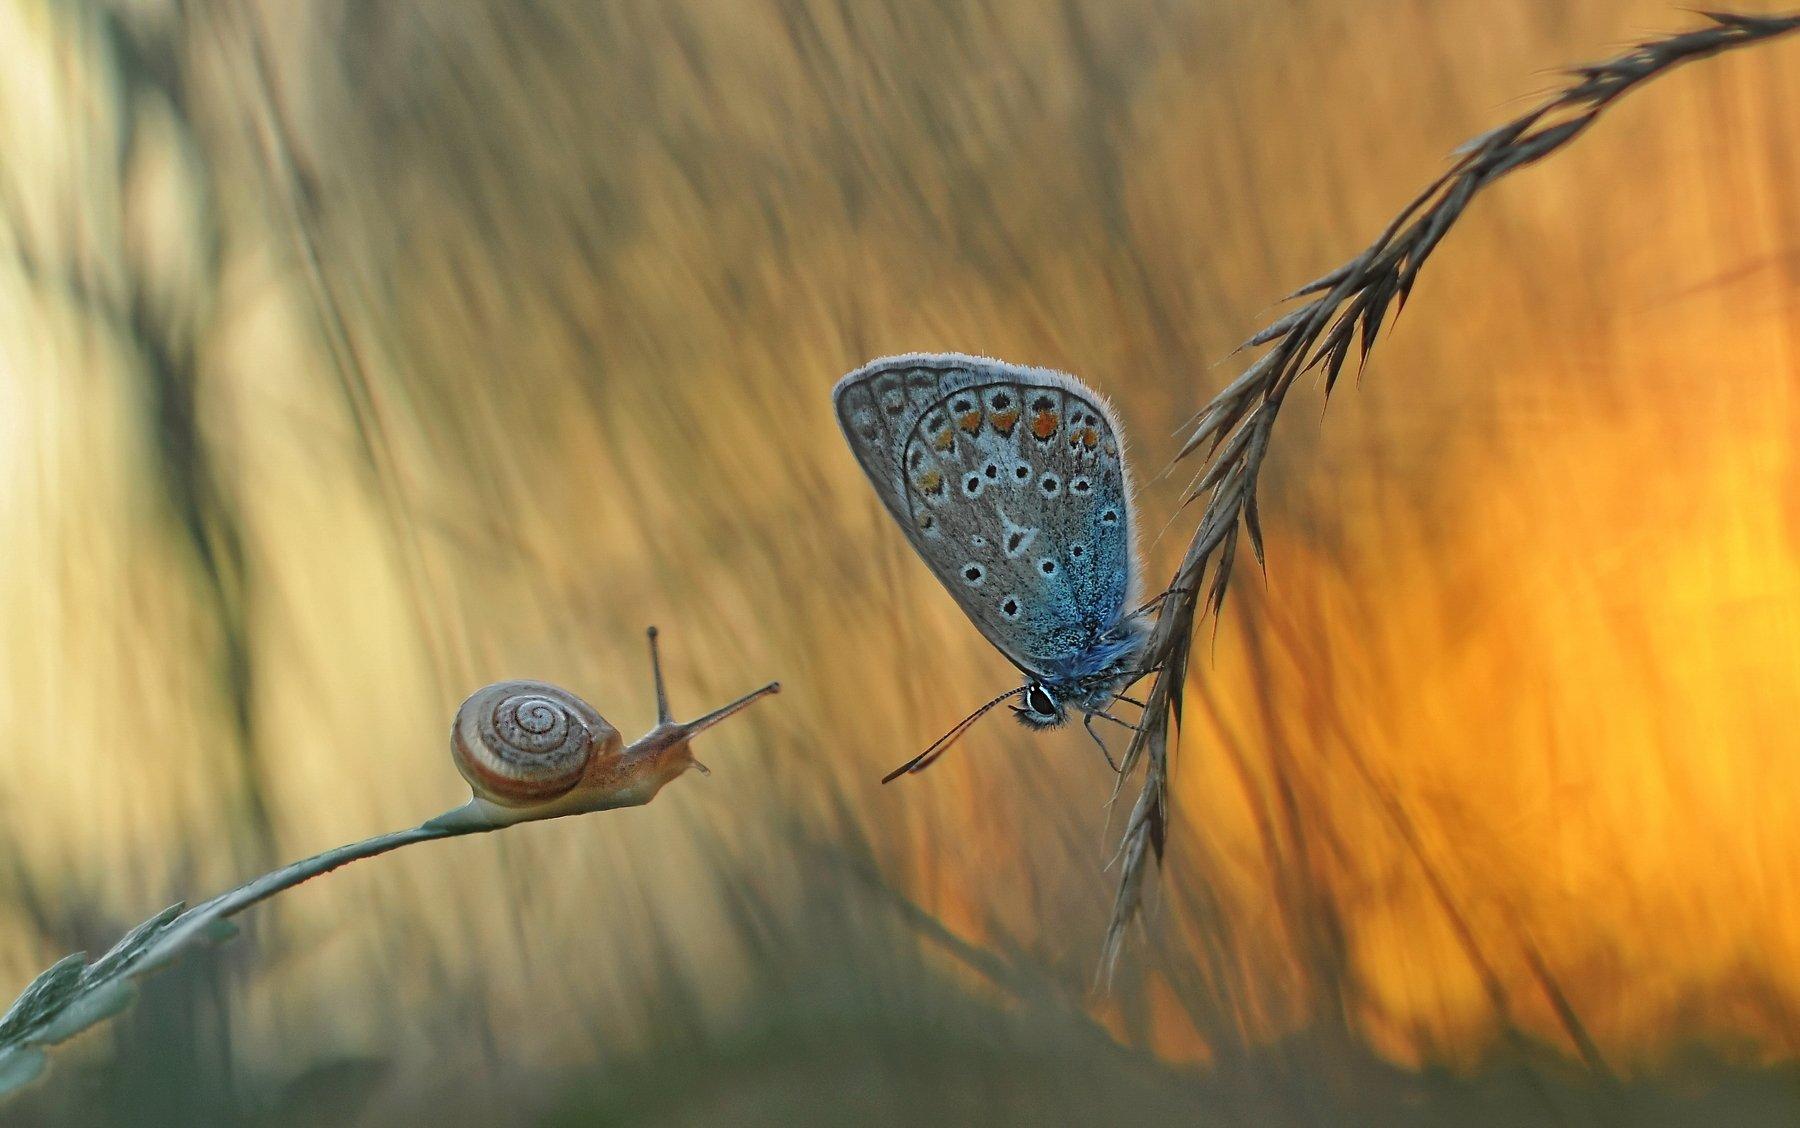 закат, бабочка, природа, улитка, Александр Гвоздь